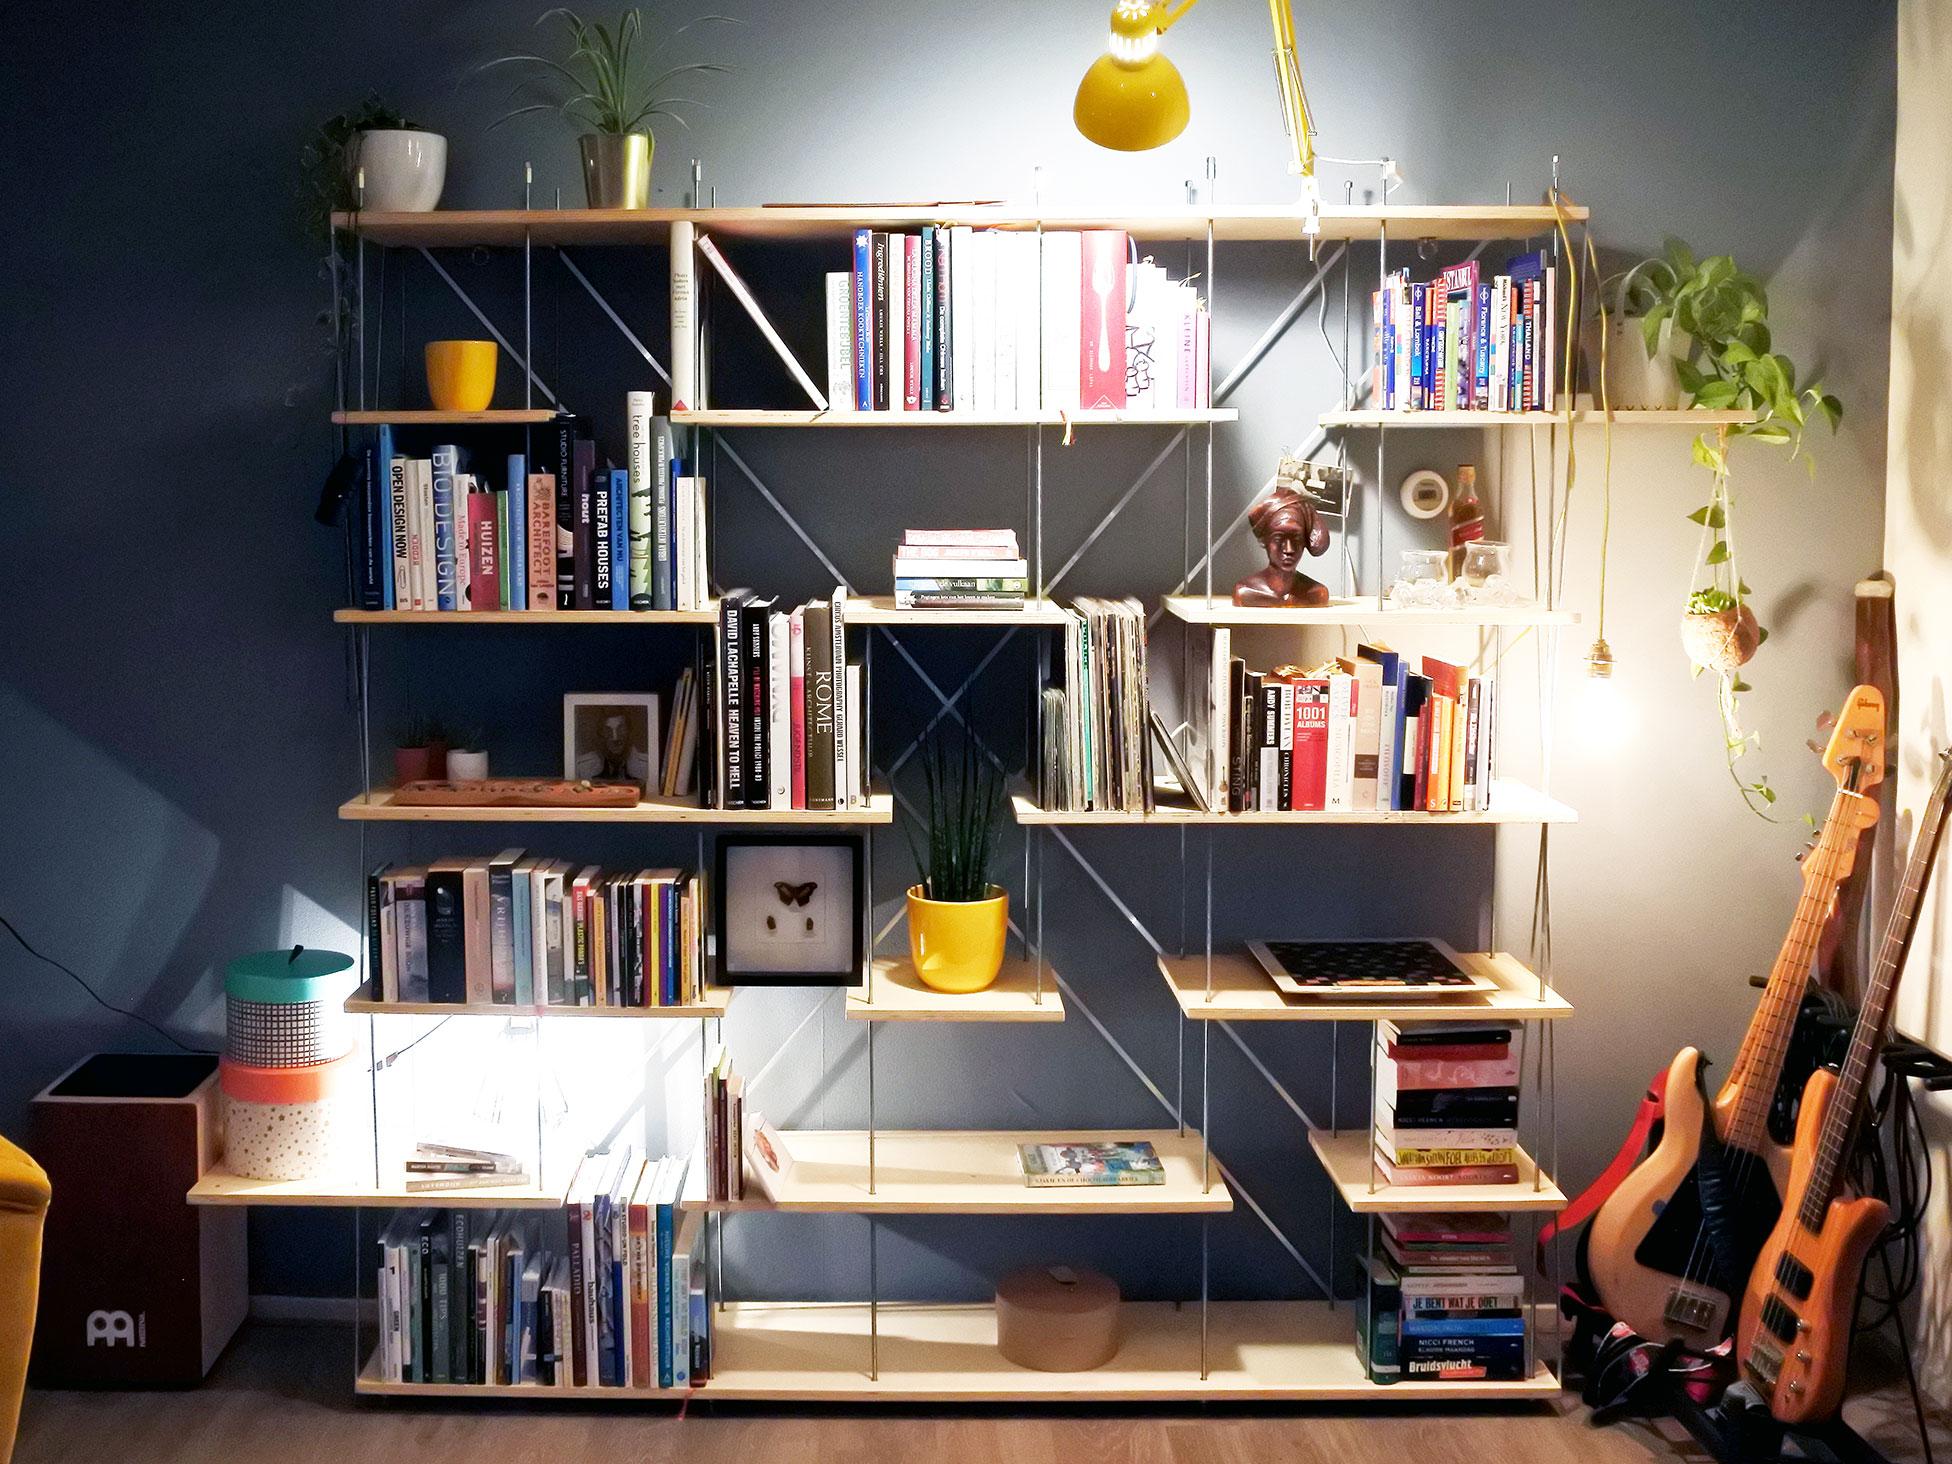 Boekenkast Voor Uitnodigend : No.arch u2013 architectuur ontwerp mikado stoel